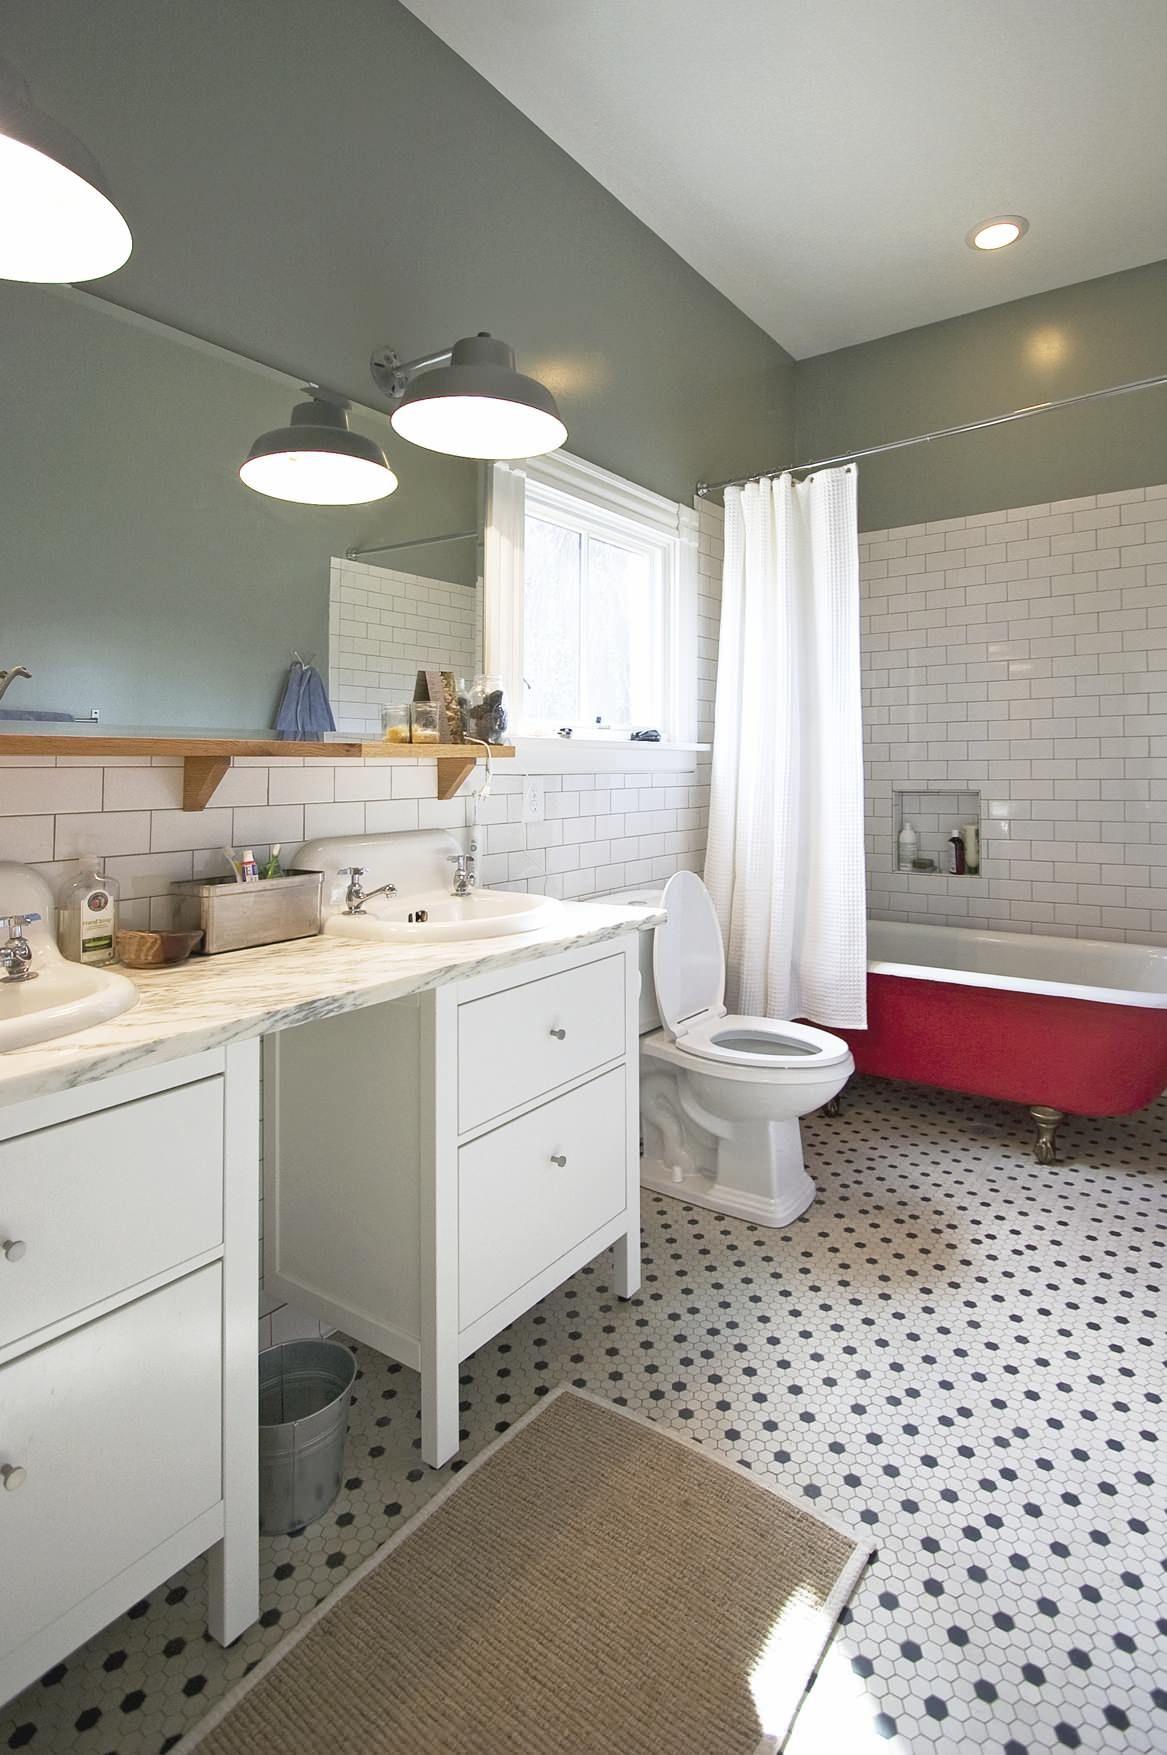 Modern Bathroom Decoration Features Classic Clawfoot Tub: Subway ...